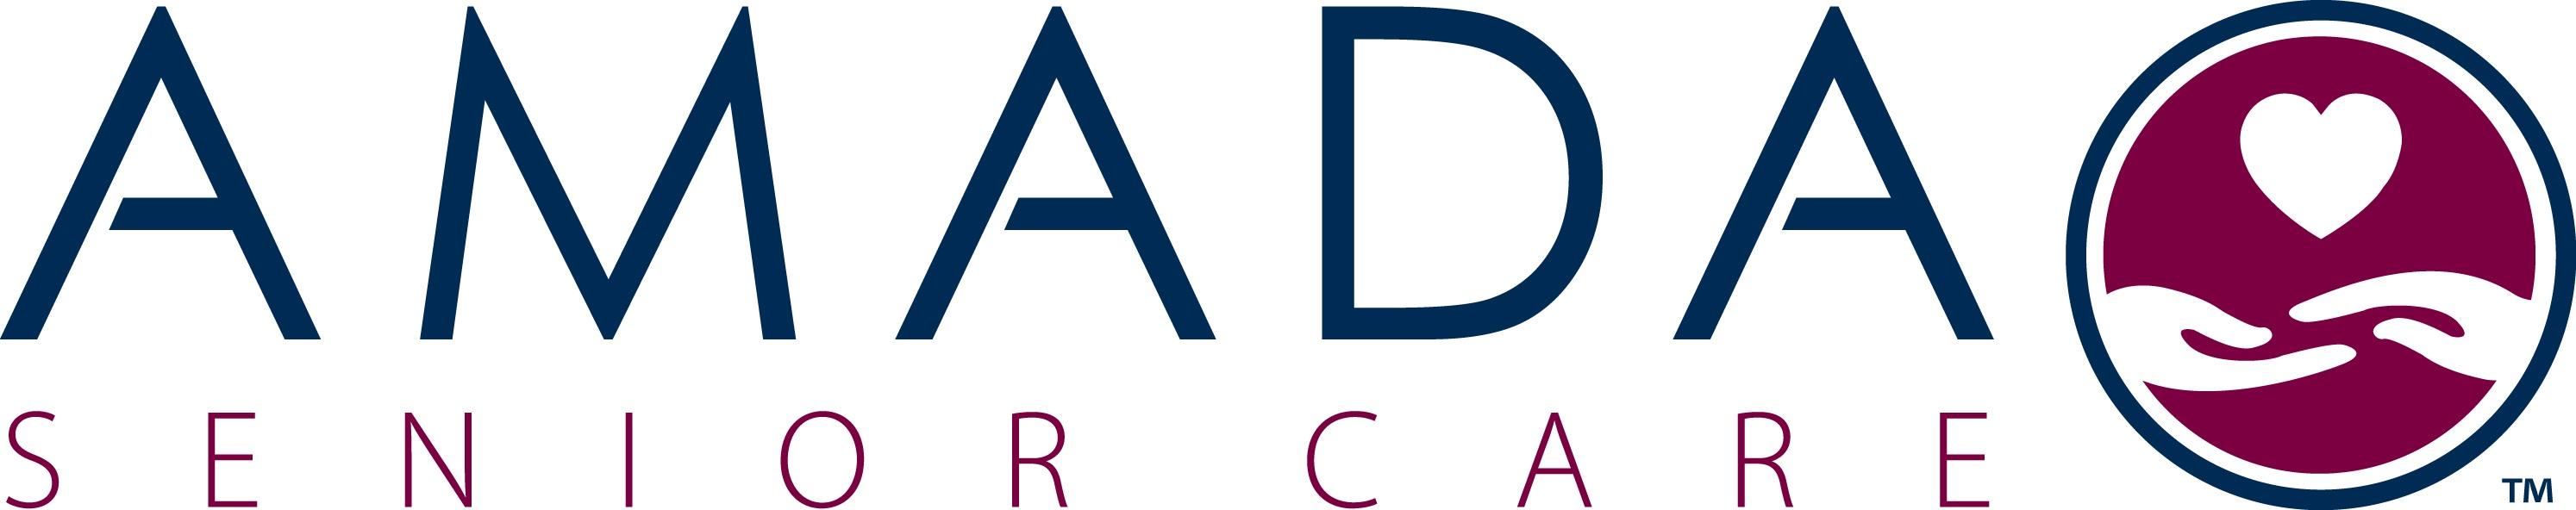 Amada Senior Care Oklahoma